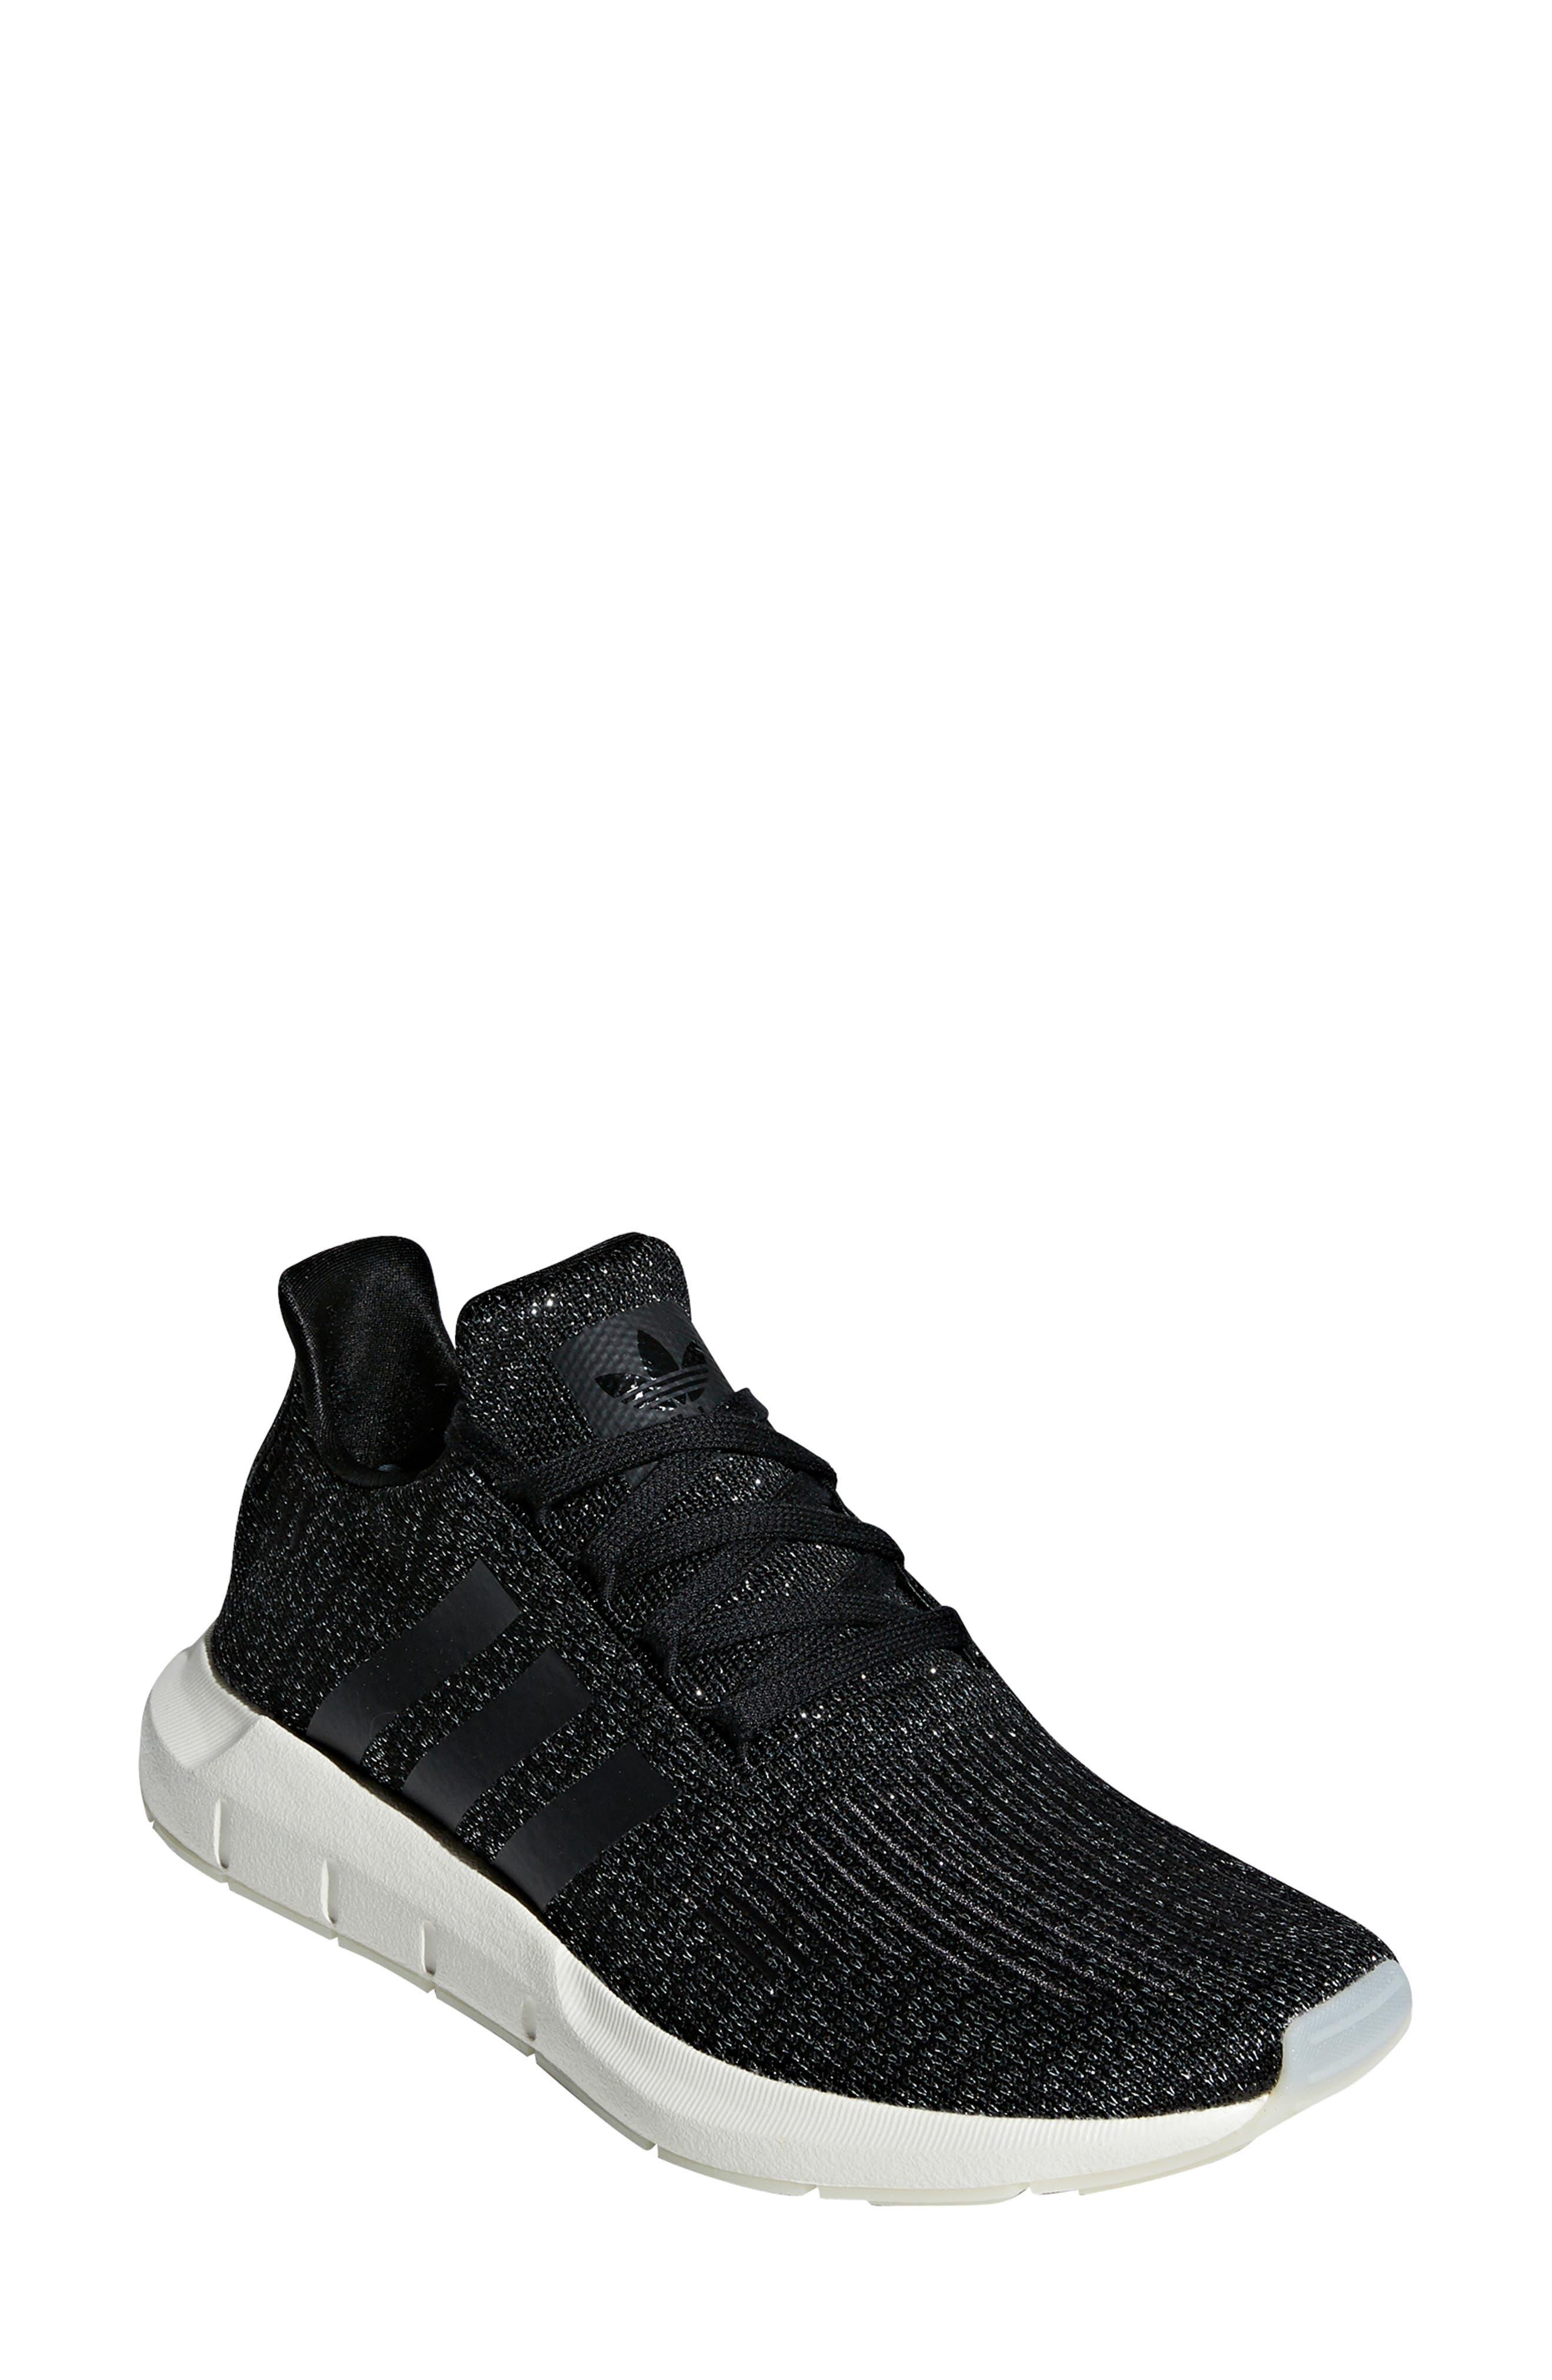 adidas | Swift Run Sneaker | Nordstrom Rack